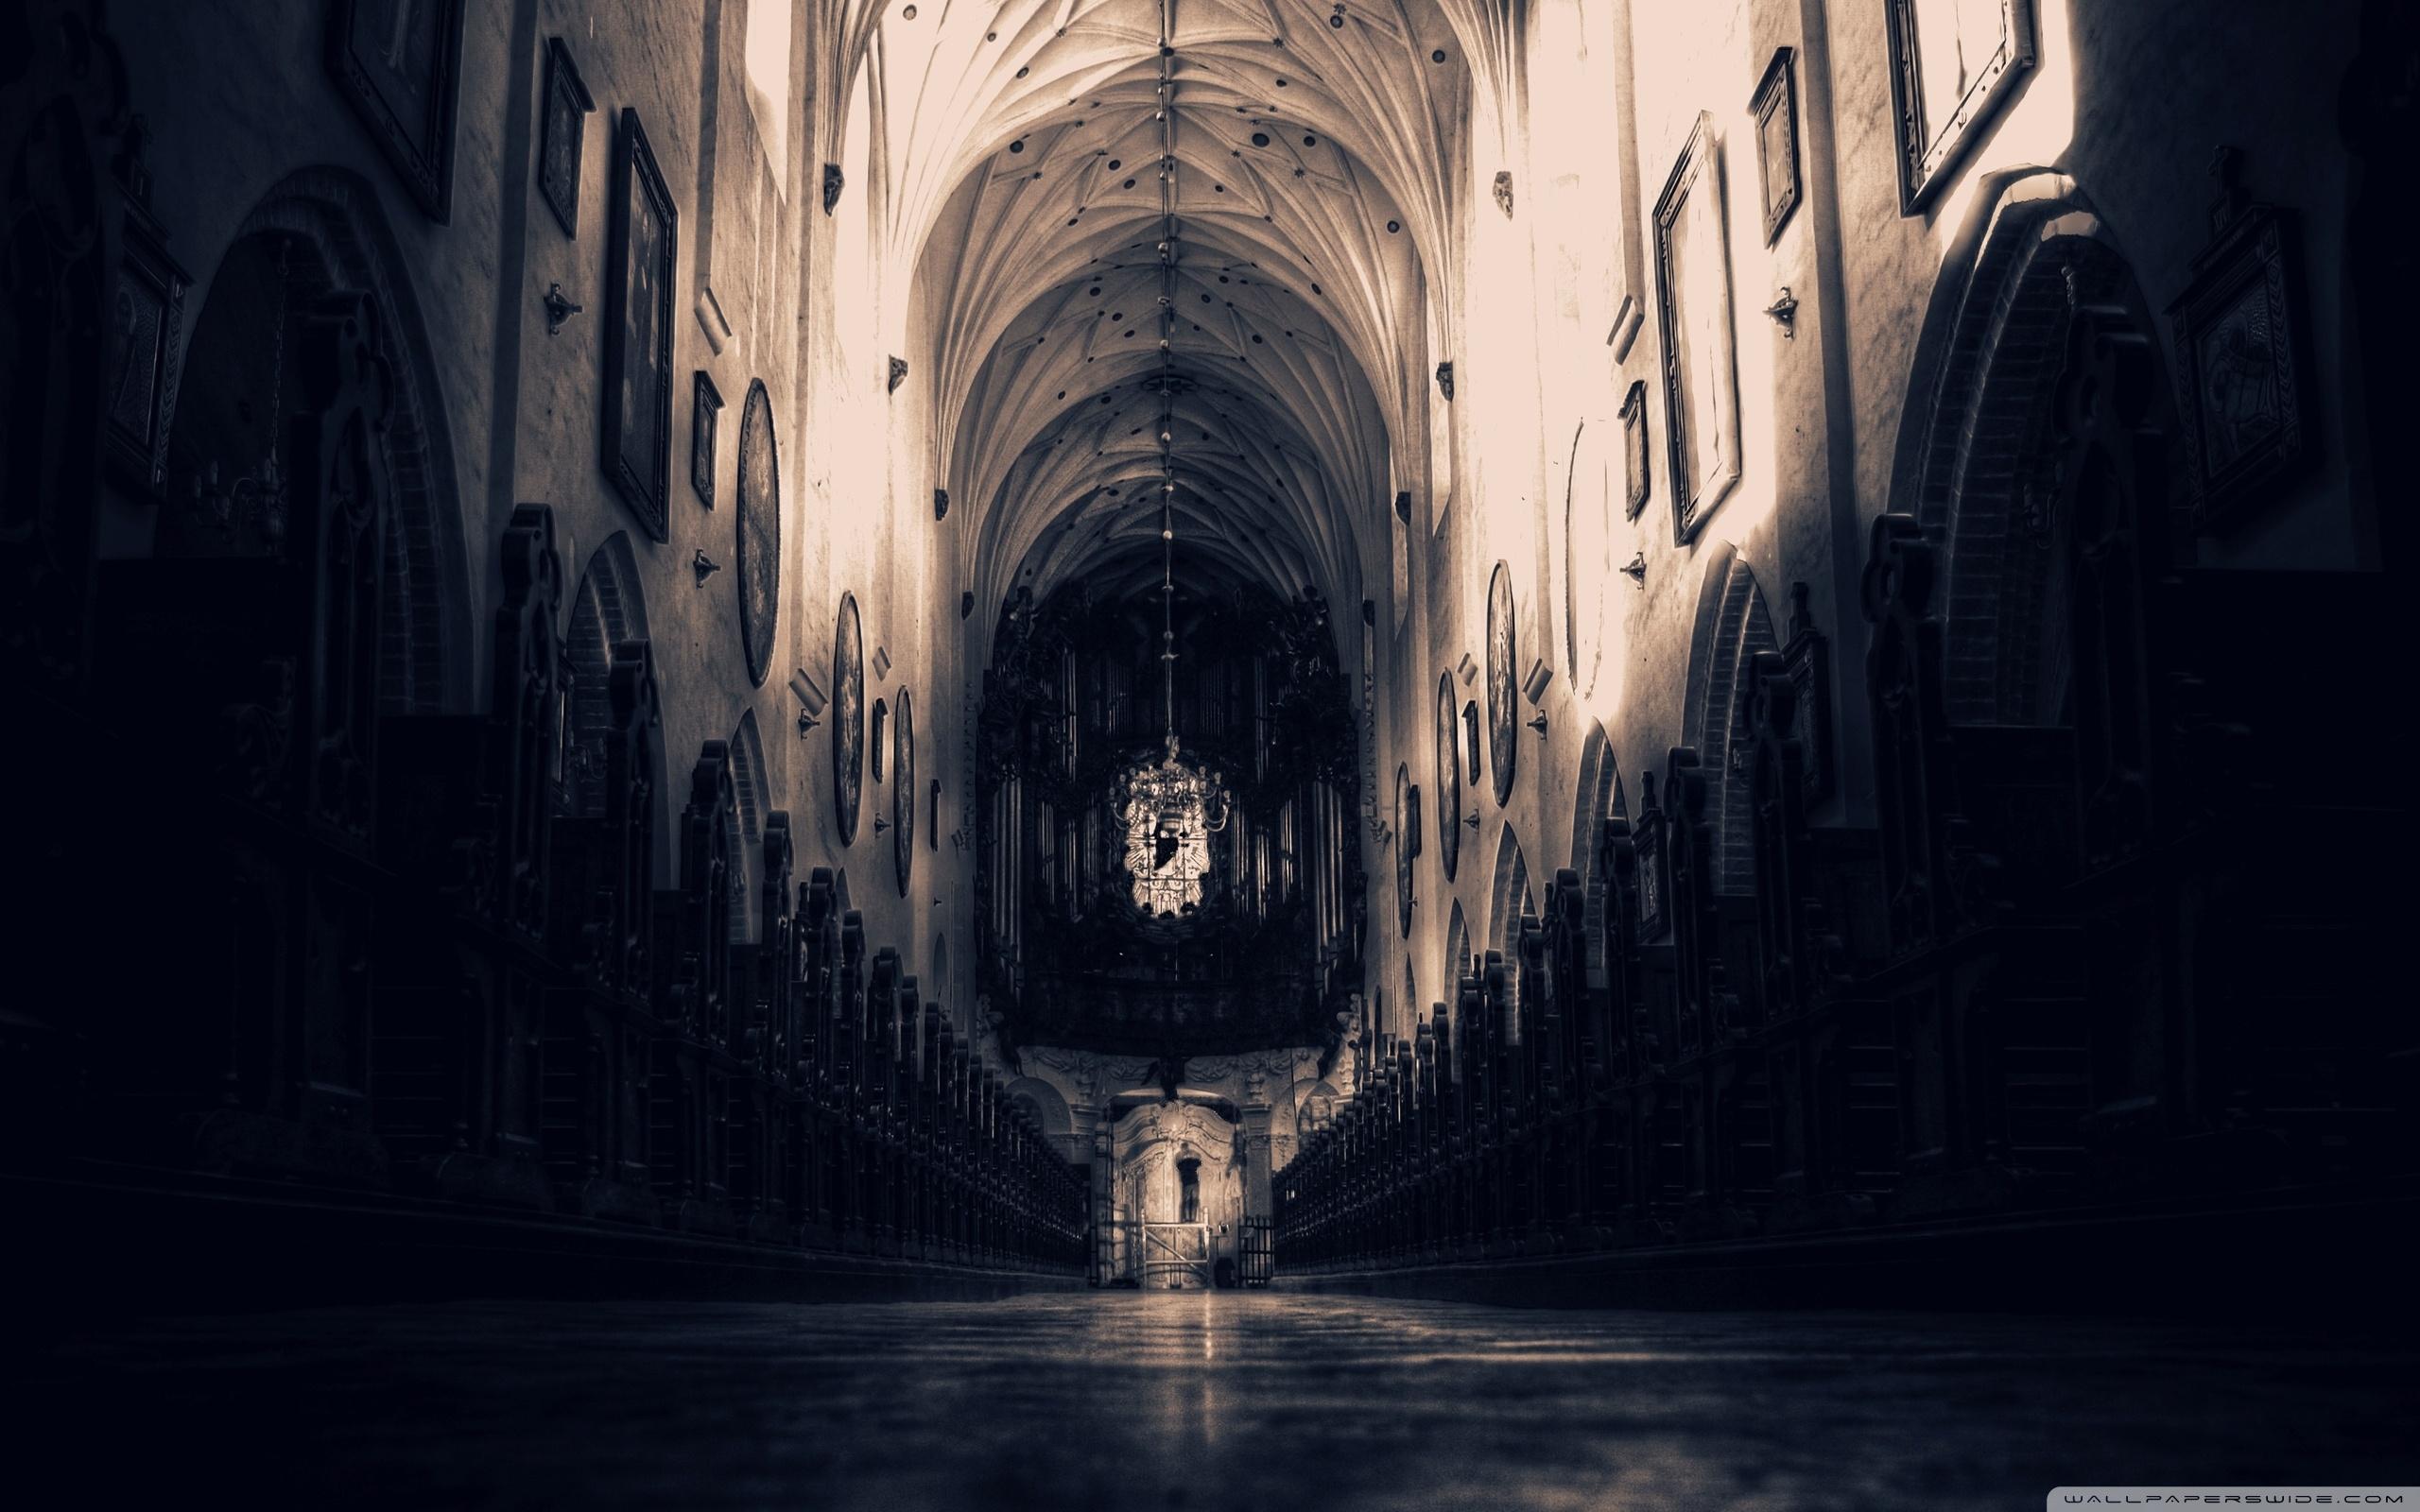 Gothic wallpaper 2560x1600 39366 2560x1600